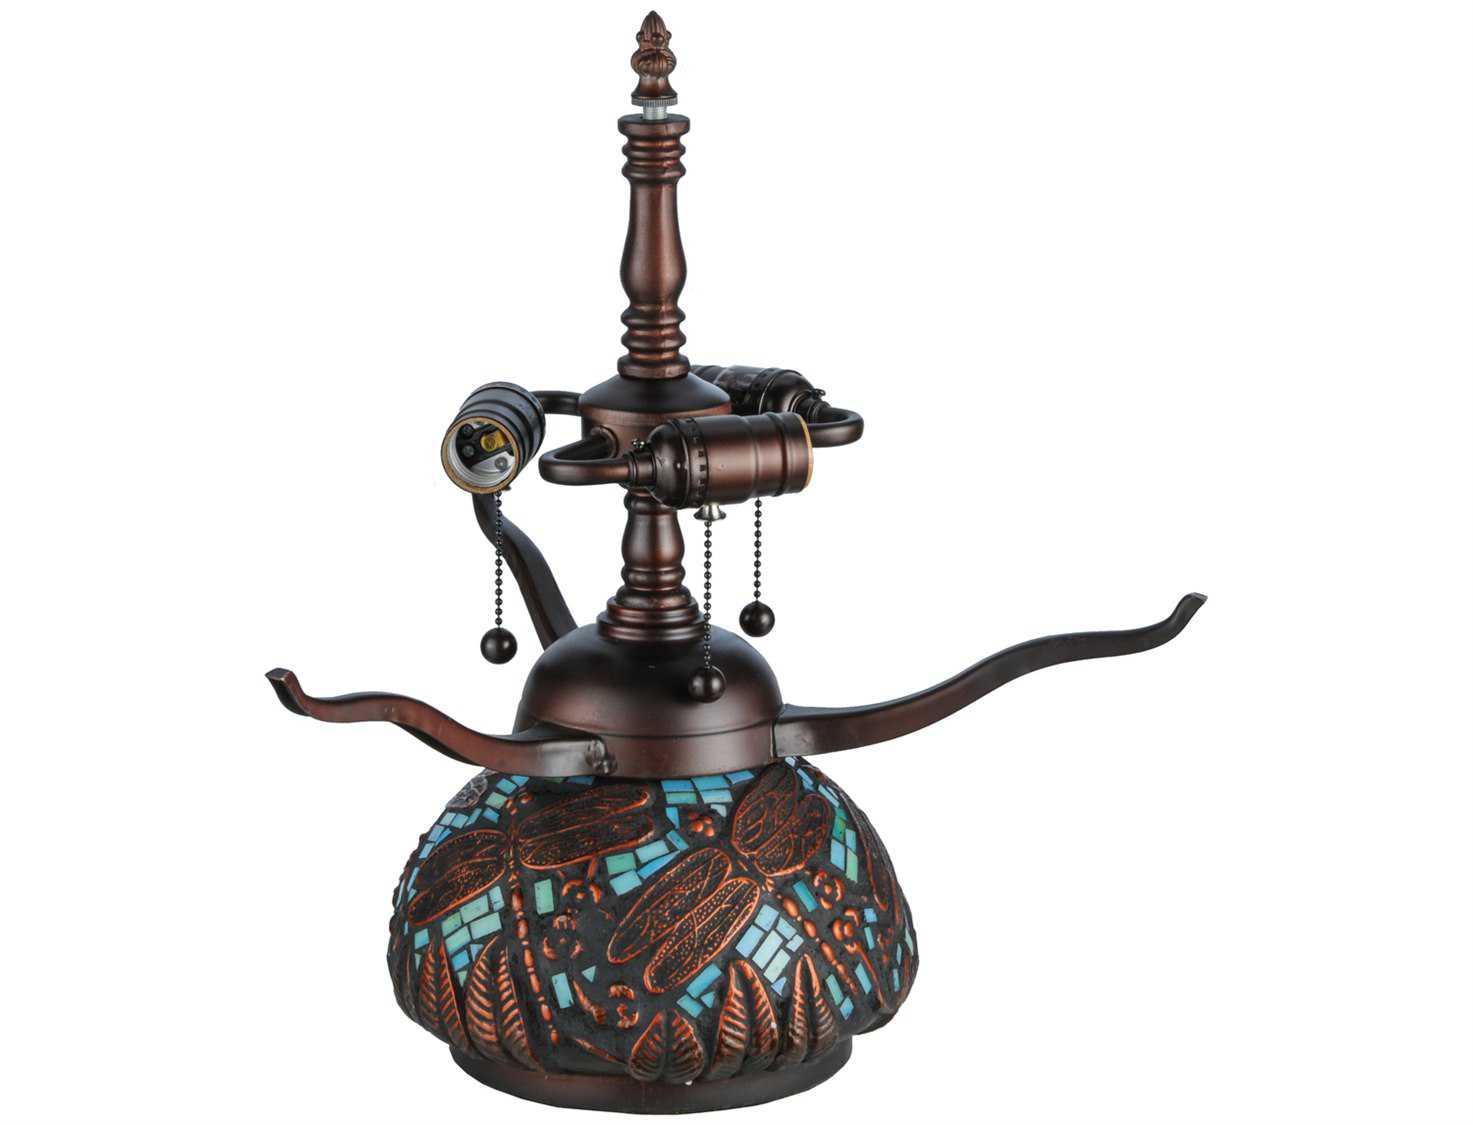 Meyda Tiffany Dragonfly Mosaic Table Lamp Base 20036